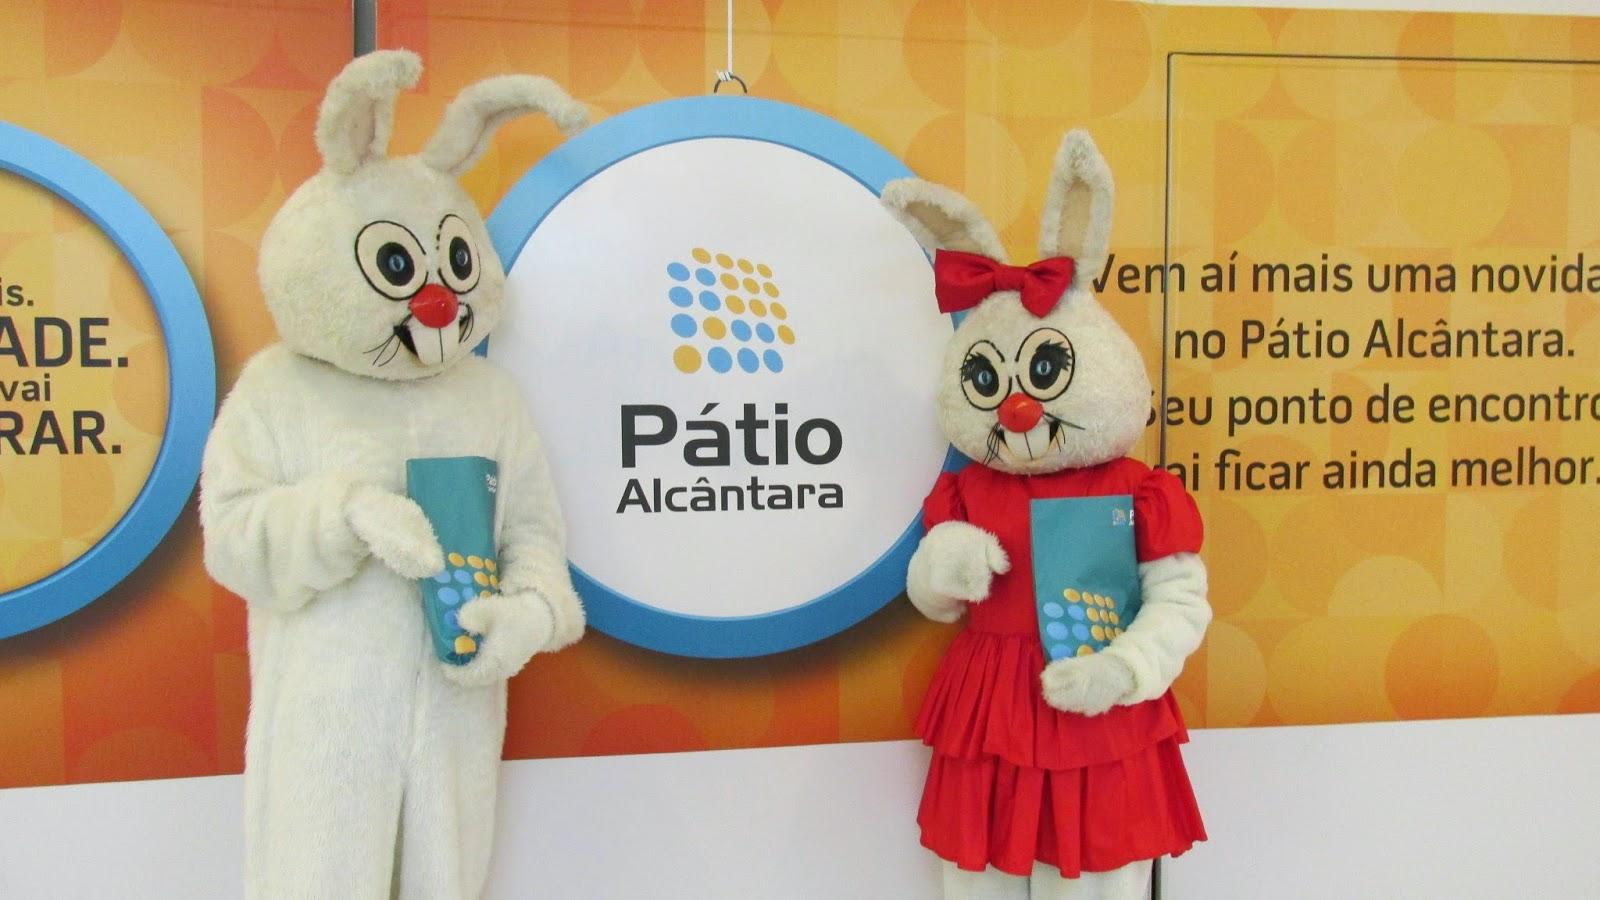 Pátio Alcântara celebra Páscoa de forma animada